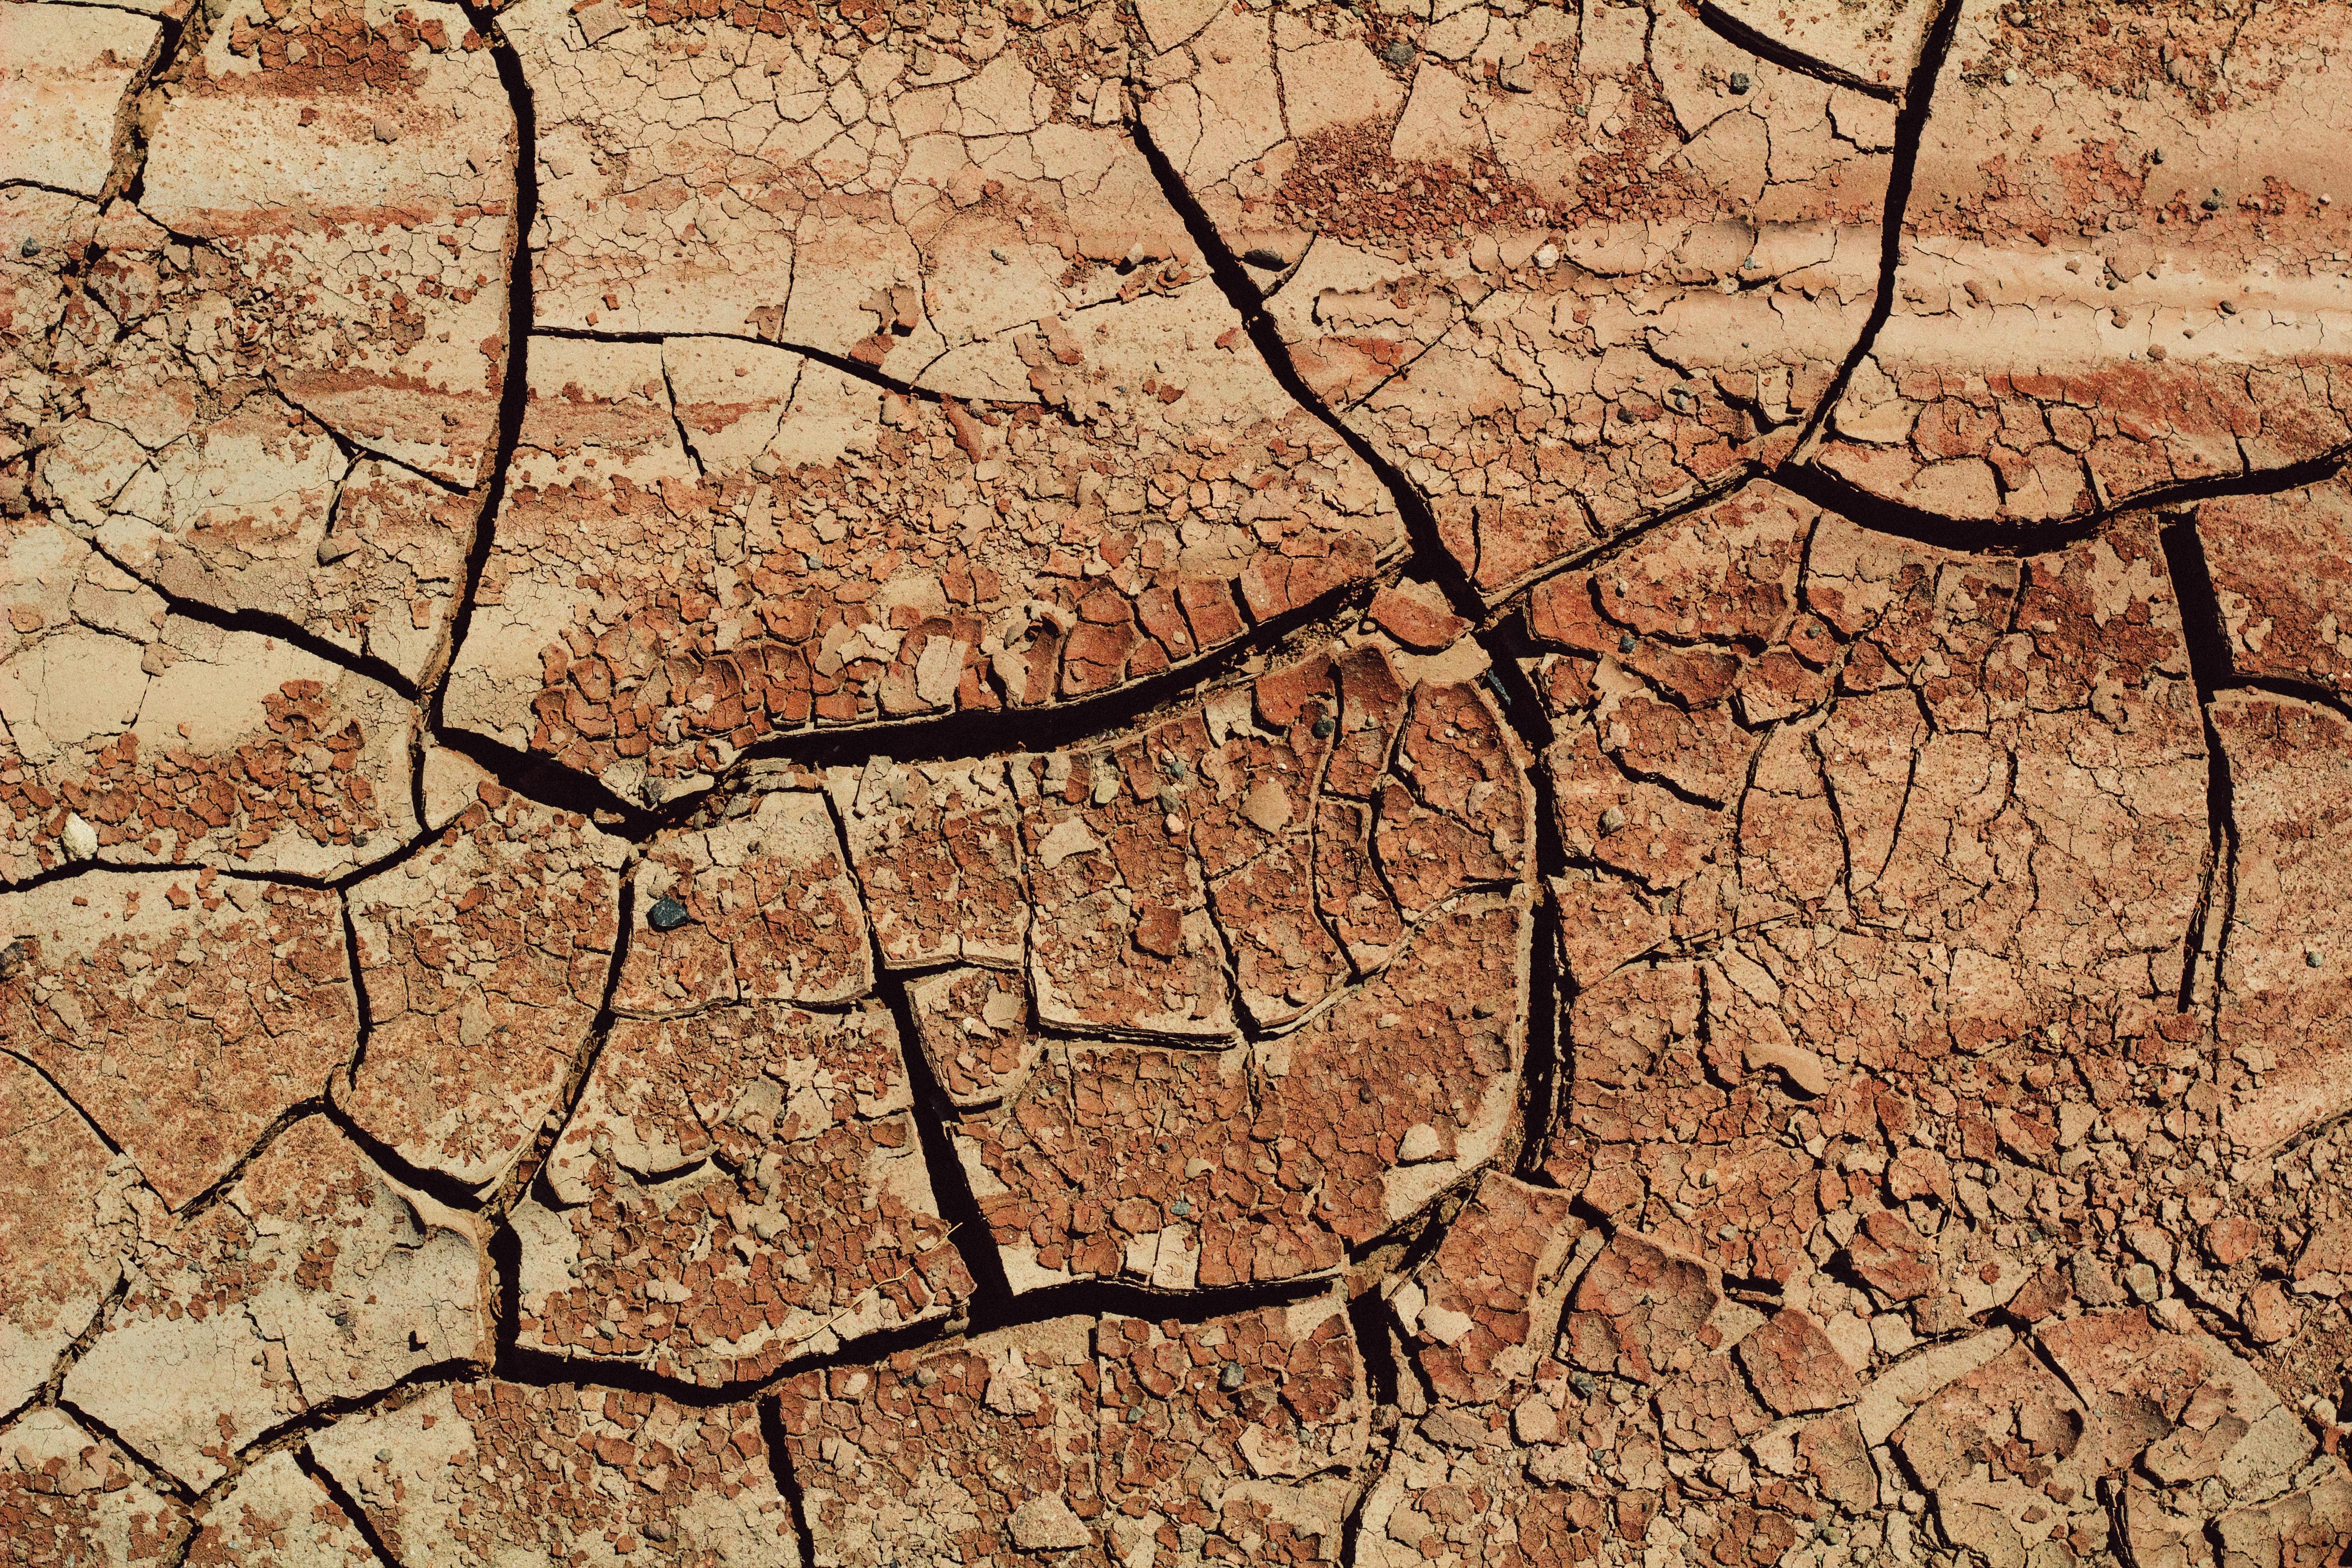 bird's eye view photo of soil